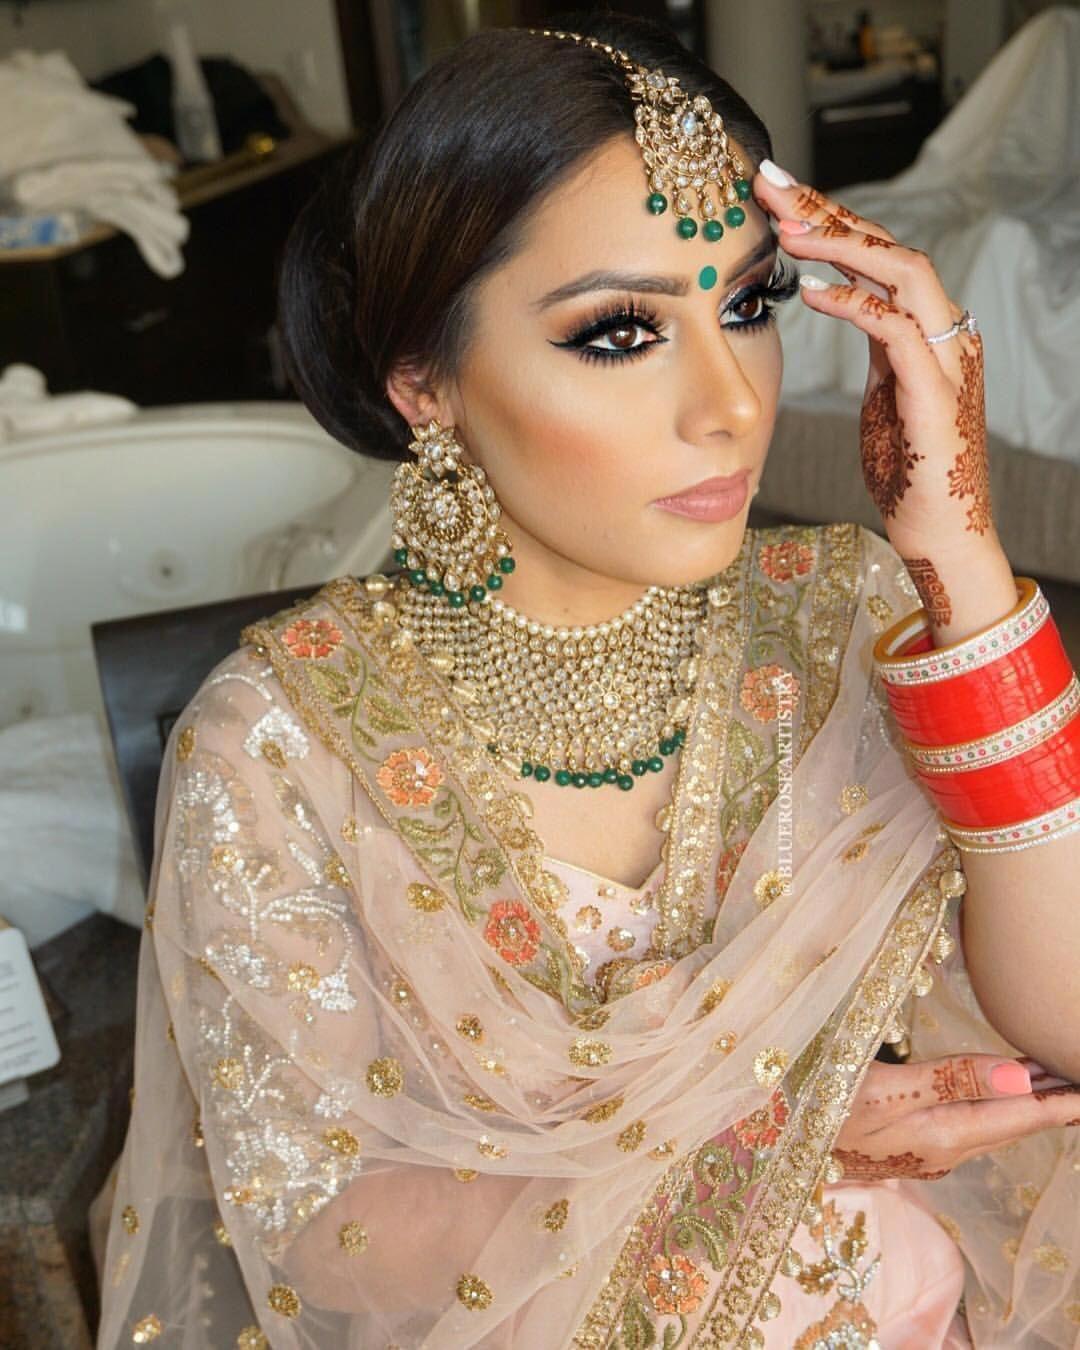 bridaljewelrywearmorethanonce | brides in 2019 | bridal